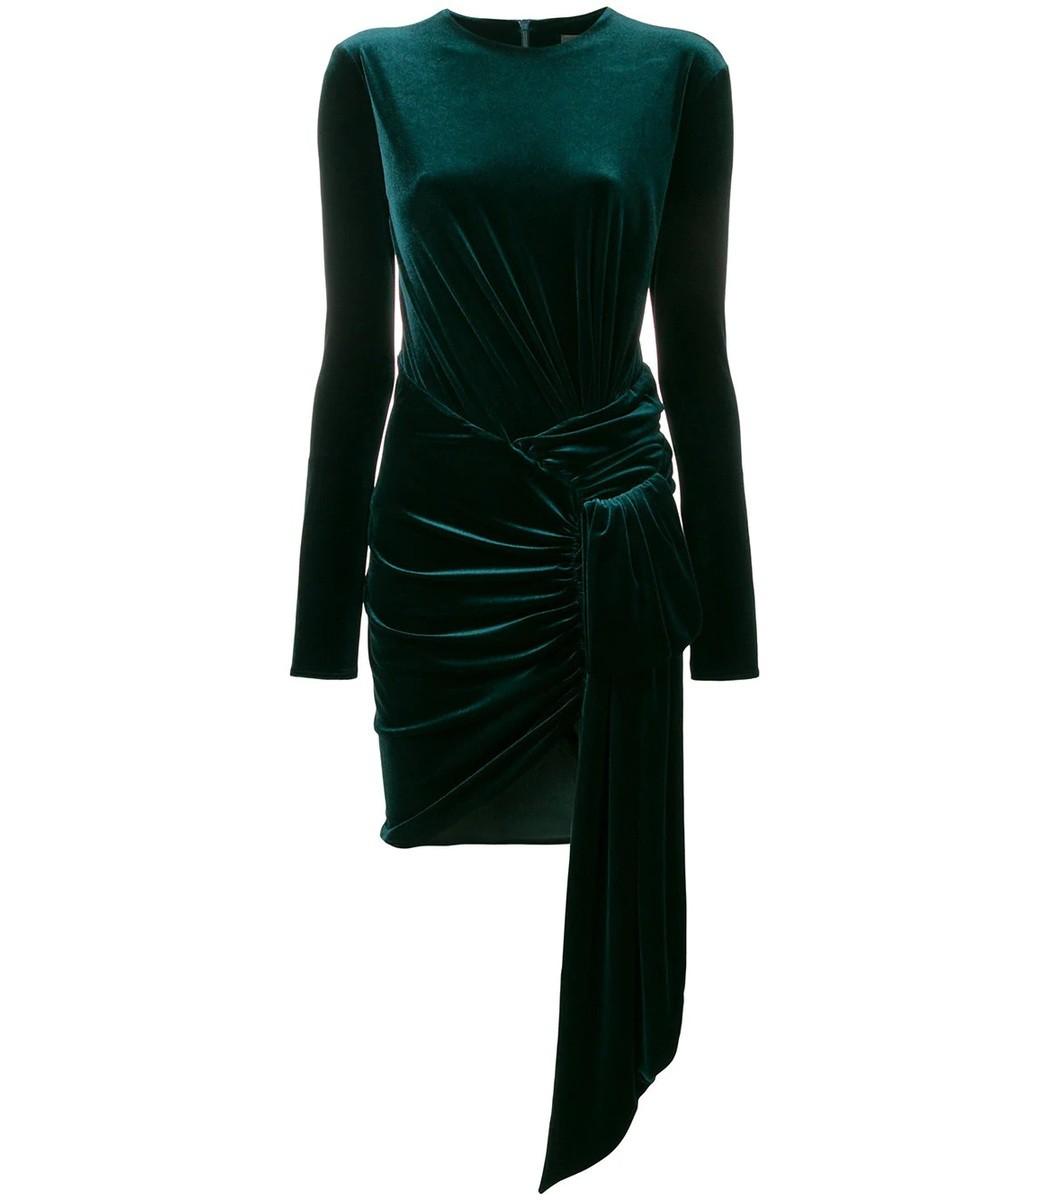 ALEXANDRE VAUTHIER Green Draped Mini Dress